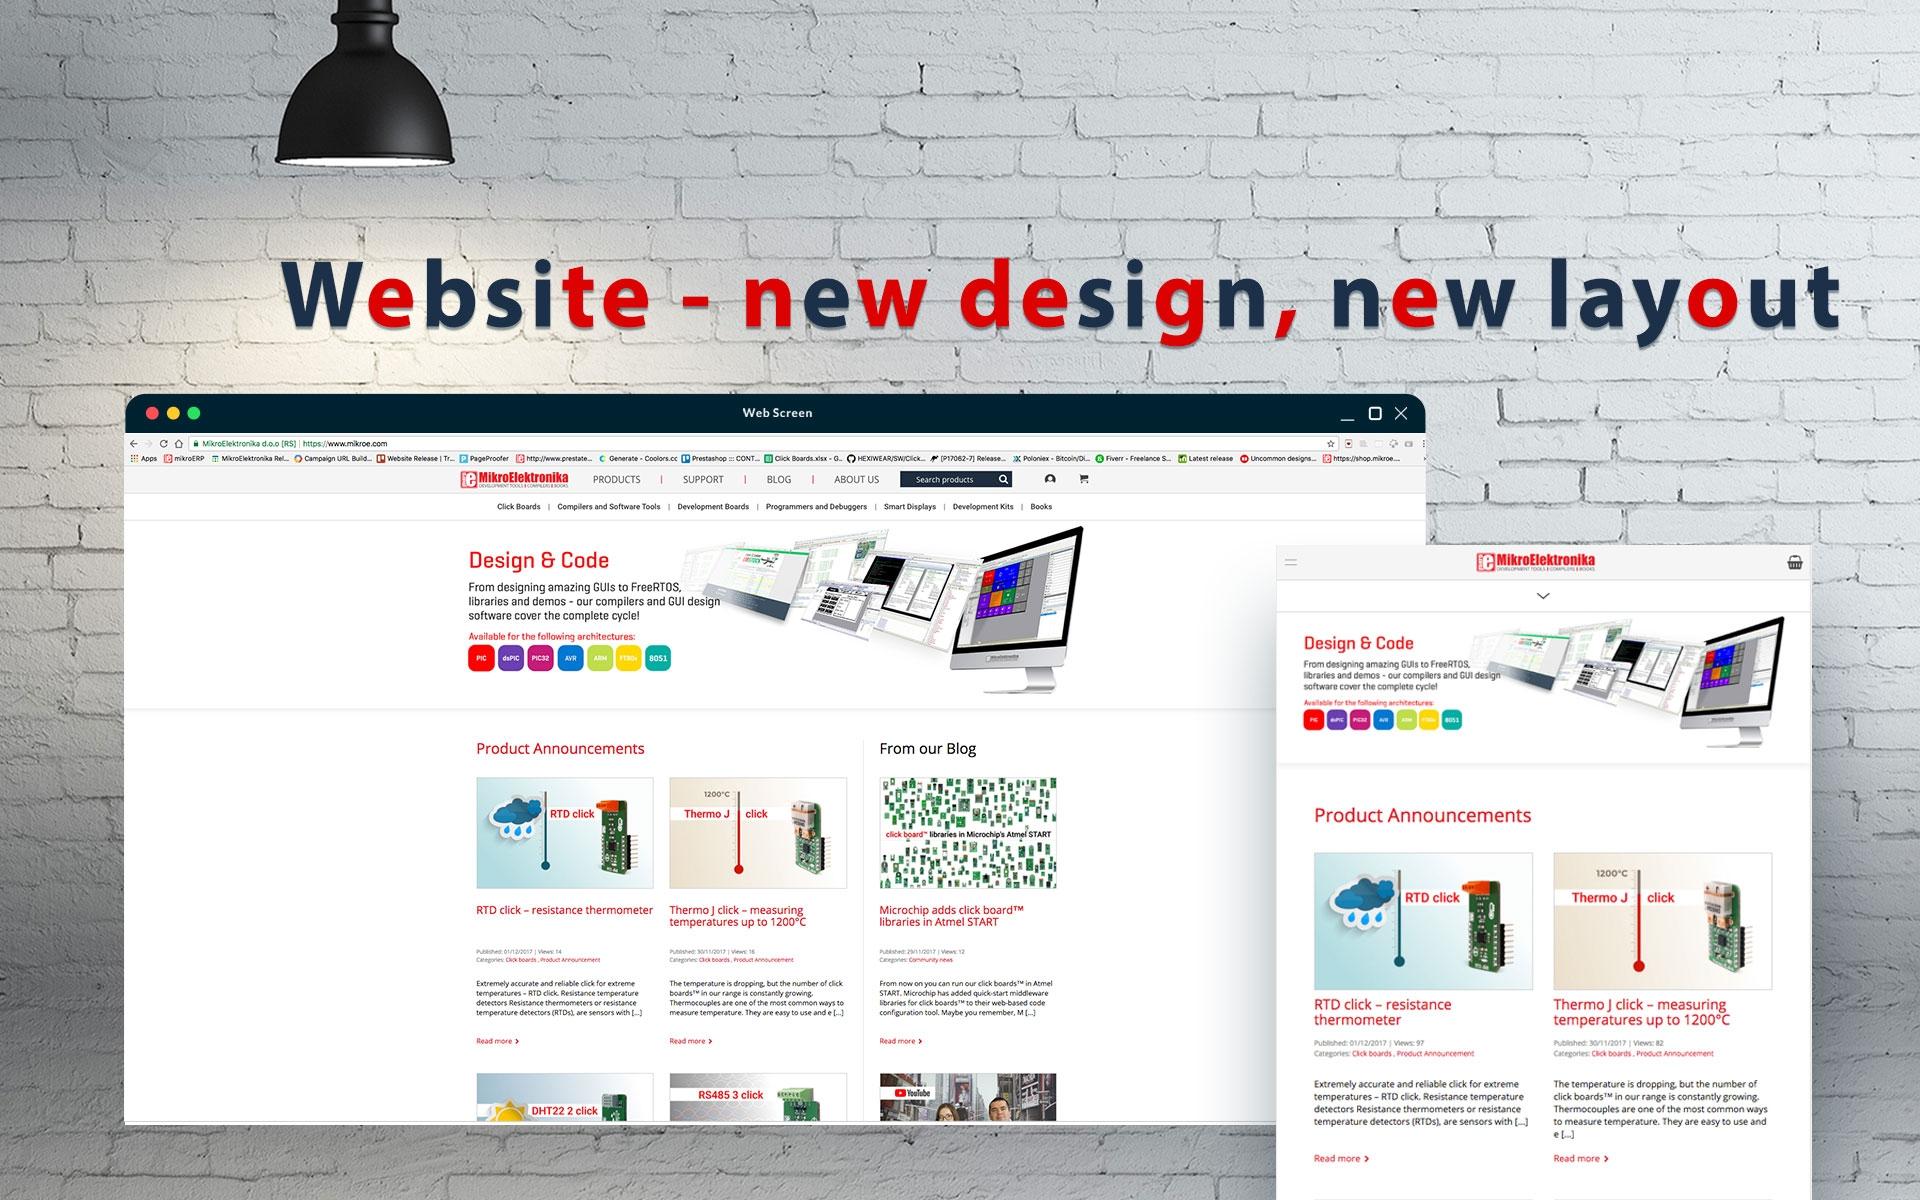 New design of the website - enjoy the improvements!